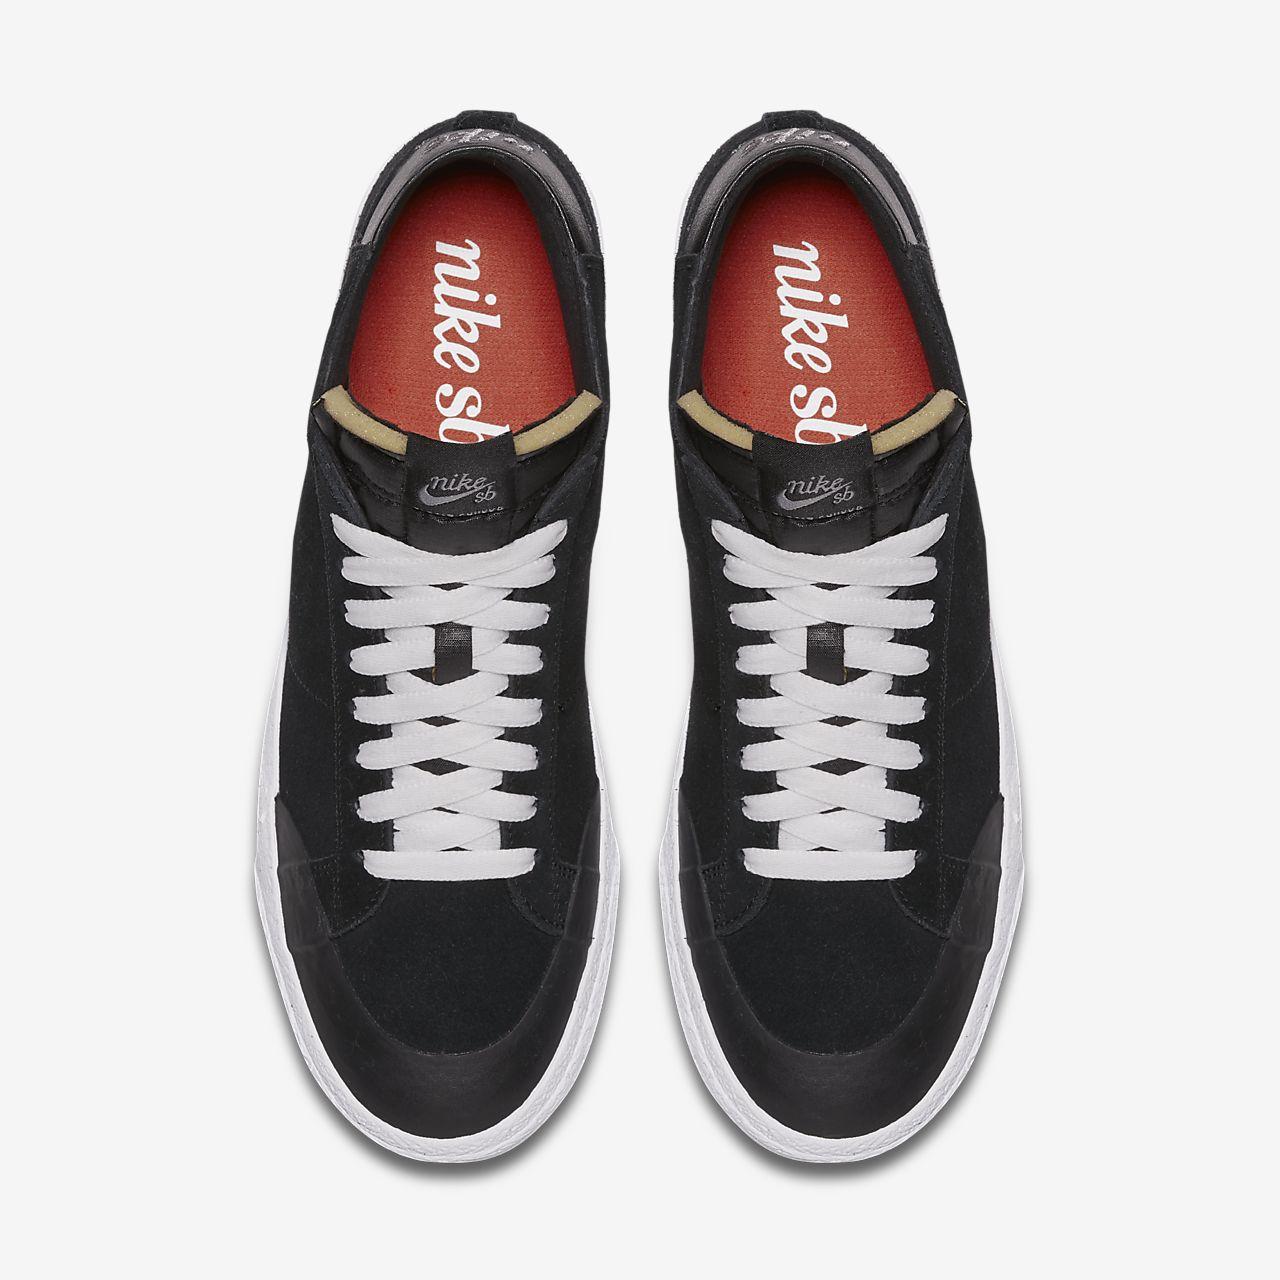 watch 9a4dc a5524 Low Resolution Nike SB Zoom Blazer Chukka XT Men s Skateboarding Shoe Nike  SB Zoom Blazer Chukka XT Men s Skateboarding Shoe